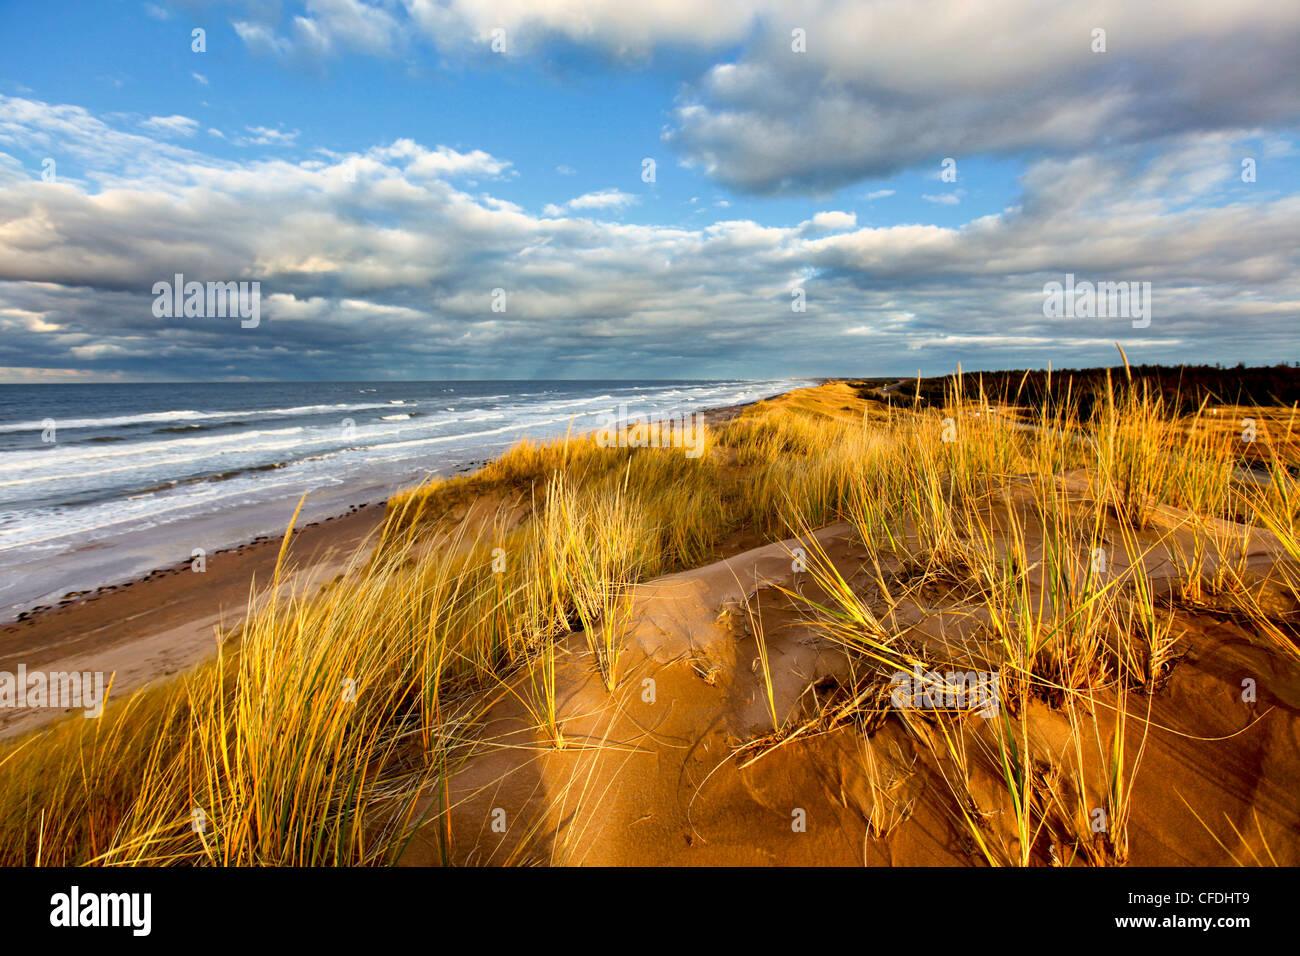 Sand Dune, Cavendish Beach, Prince Edward Island National Park, Prince Edward Island, Canada - Stock Image